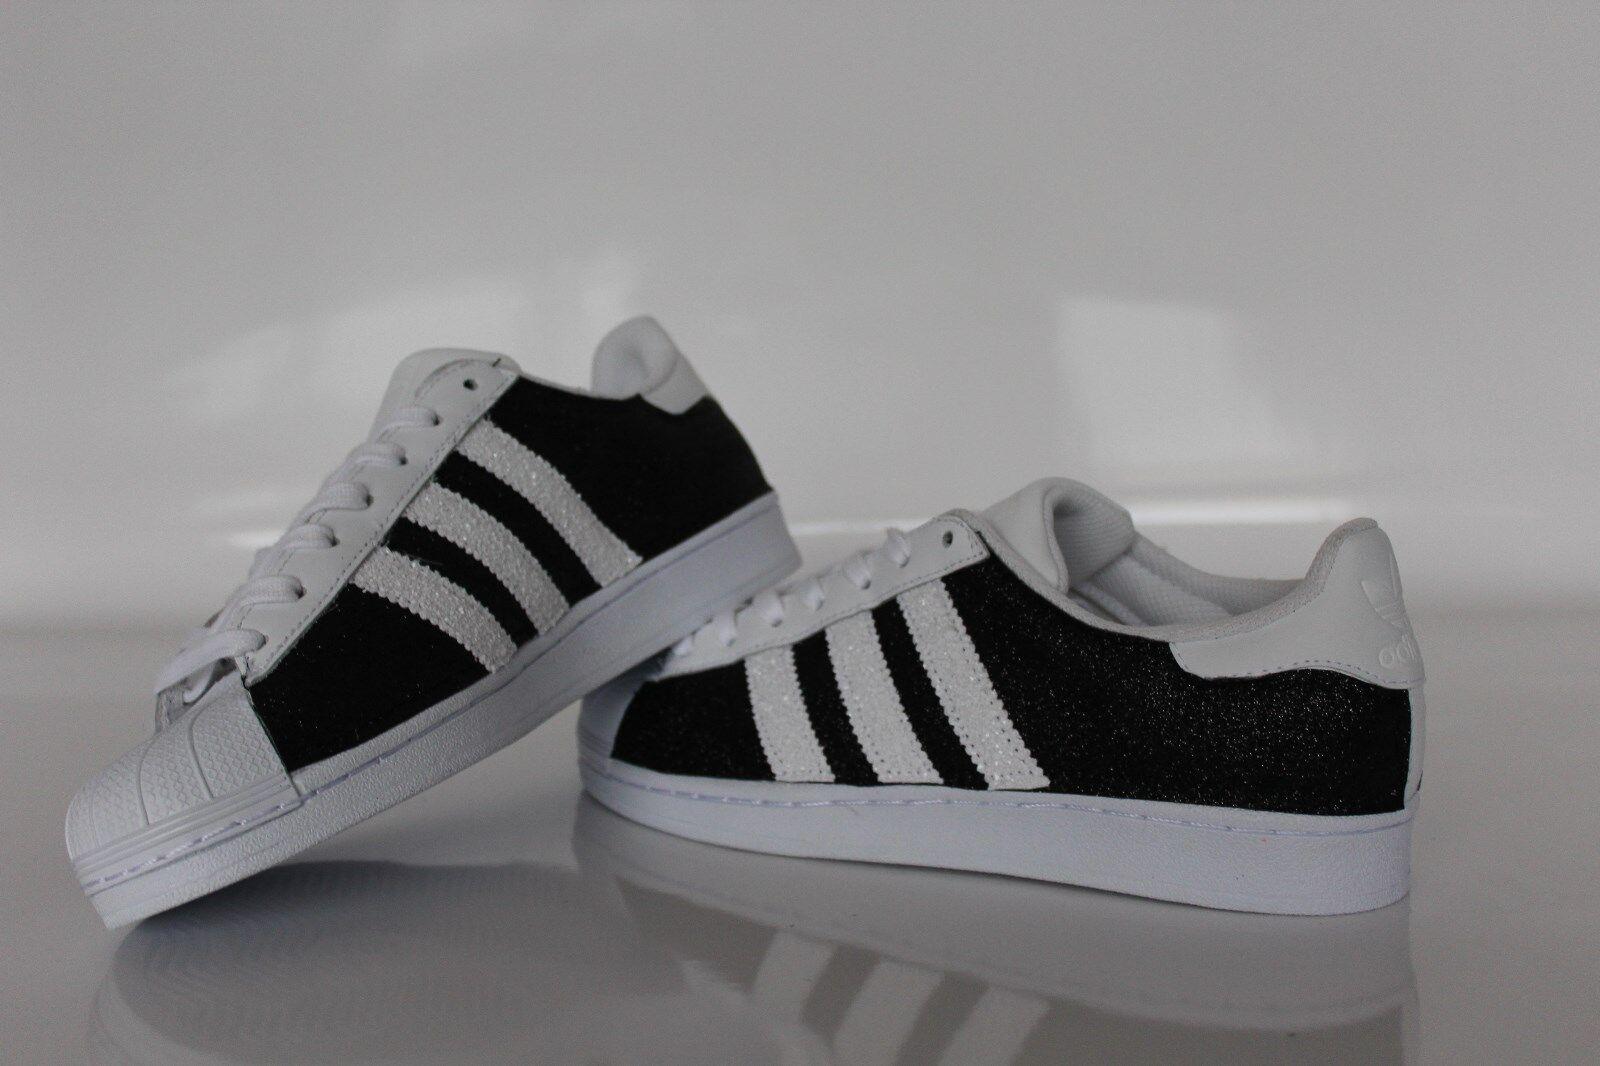 Schuhe adidas superstar im glitzer - nero glitzer bianco e fino nero - 6b9e29